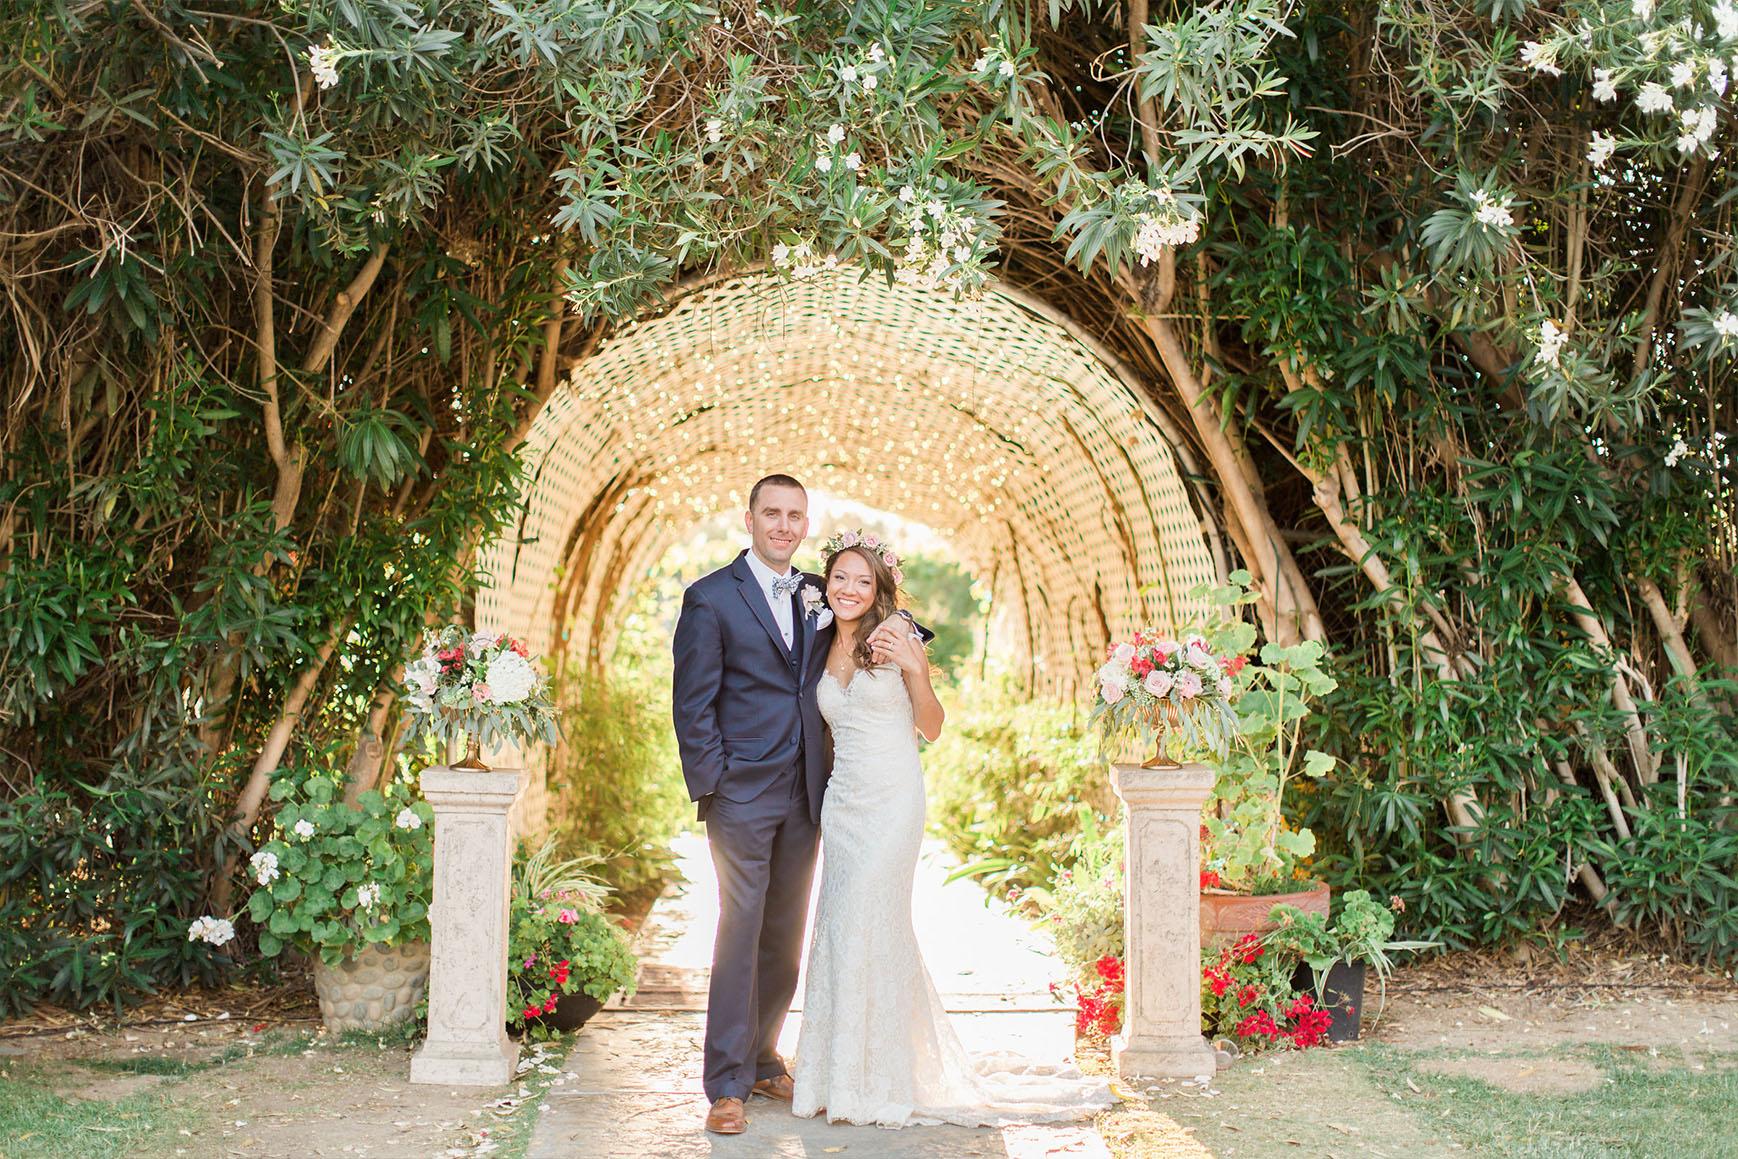 Glowing tunnel - Orchard - Menifee, California - Riverside County - Wedgewood Weddings